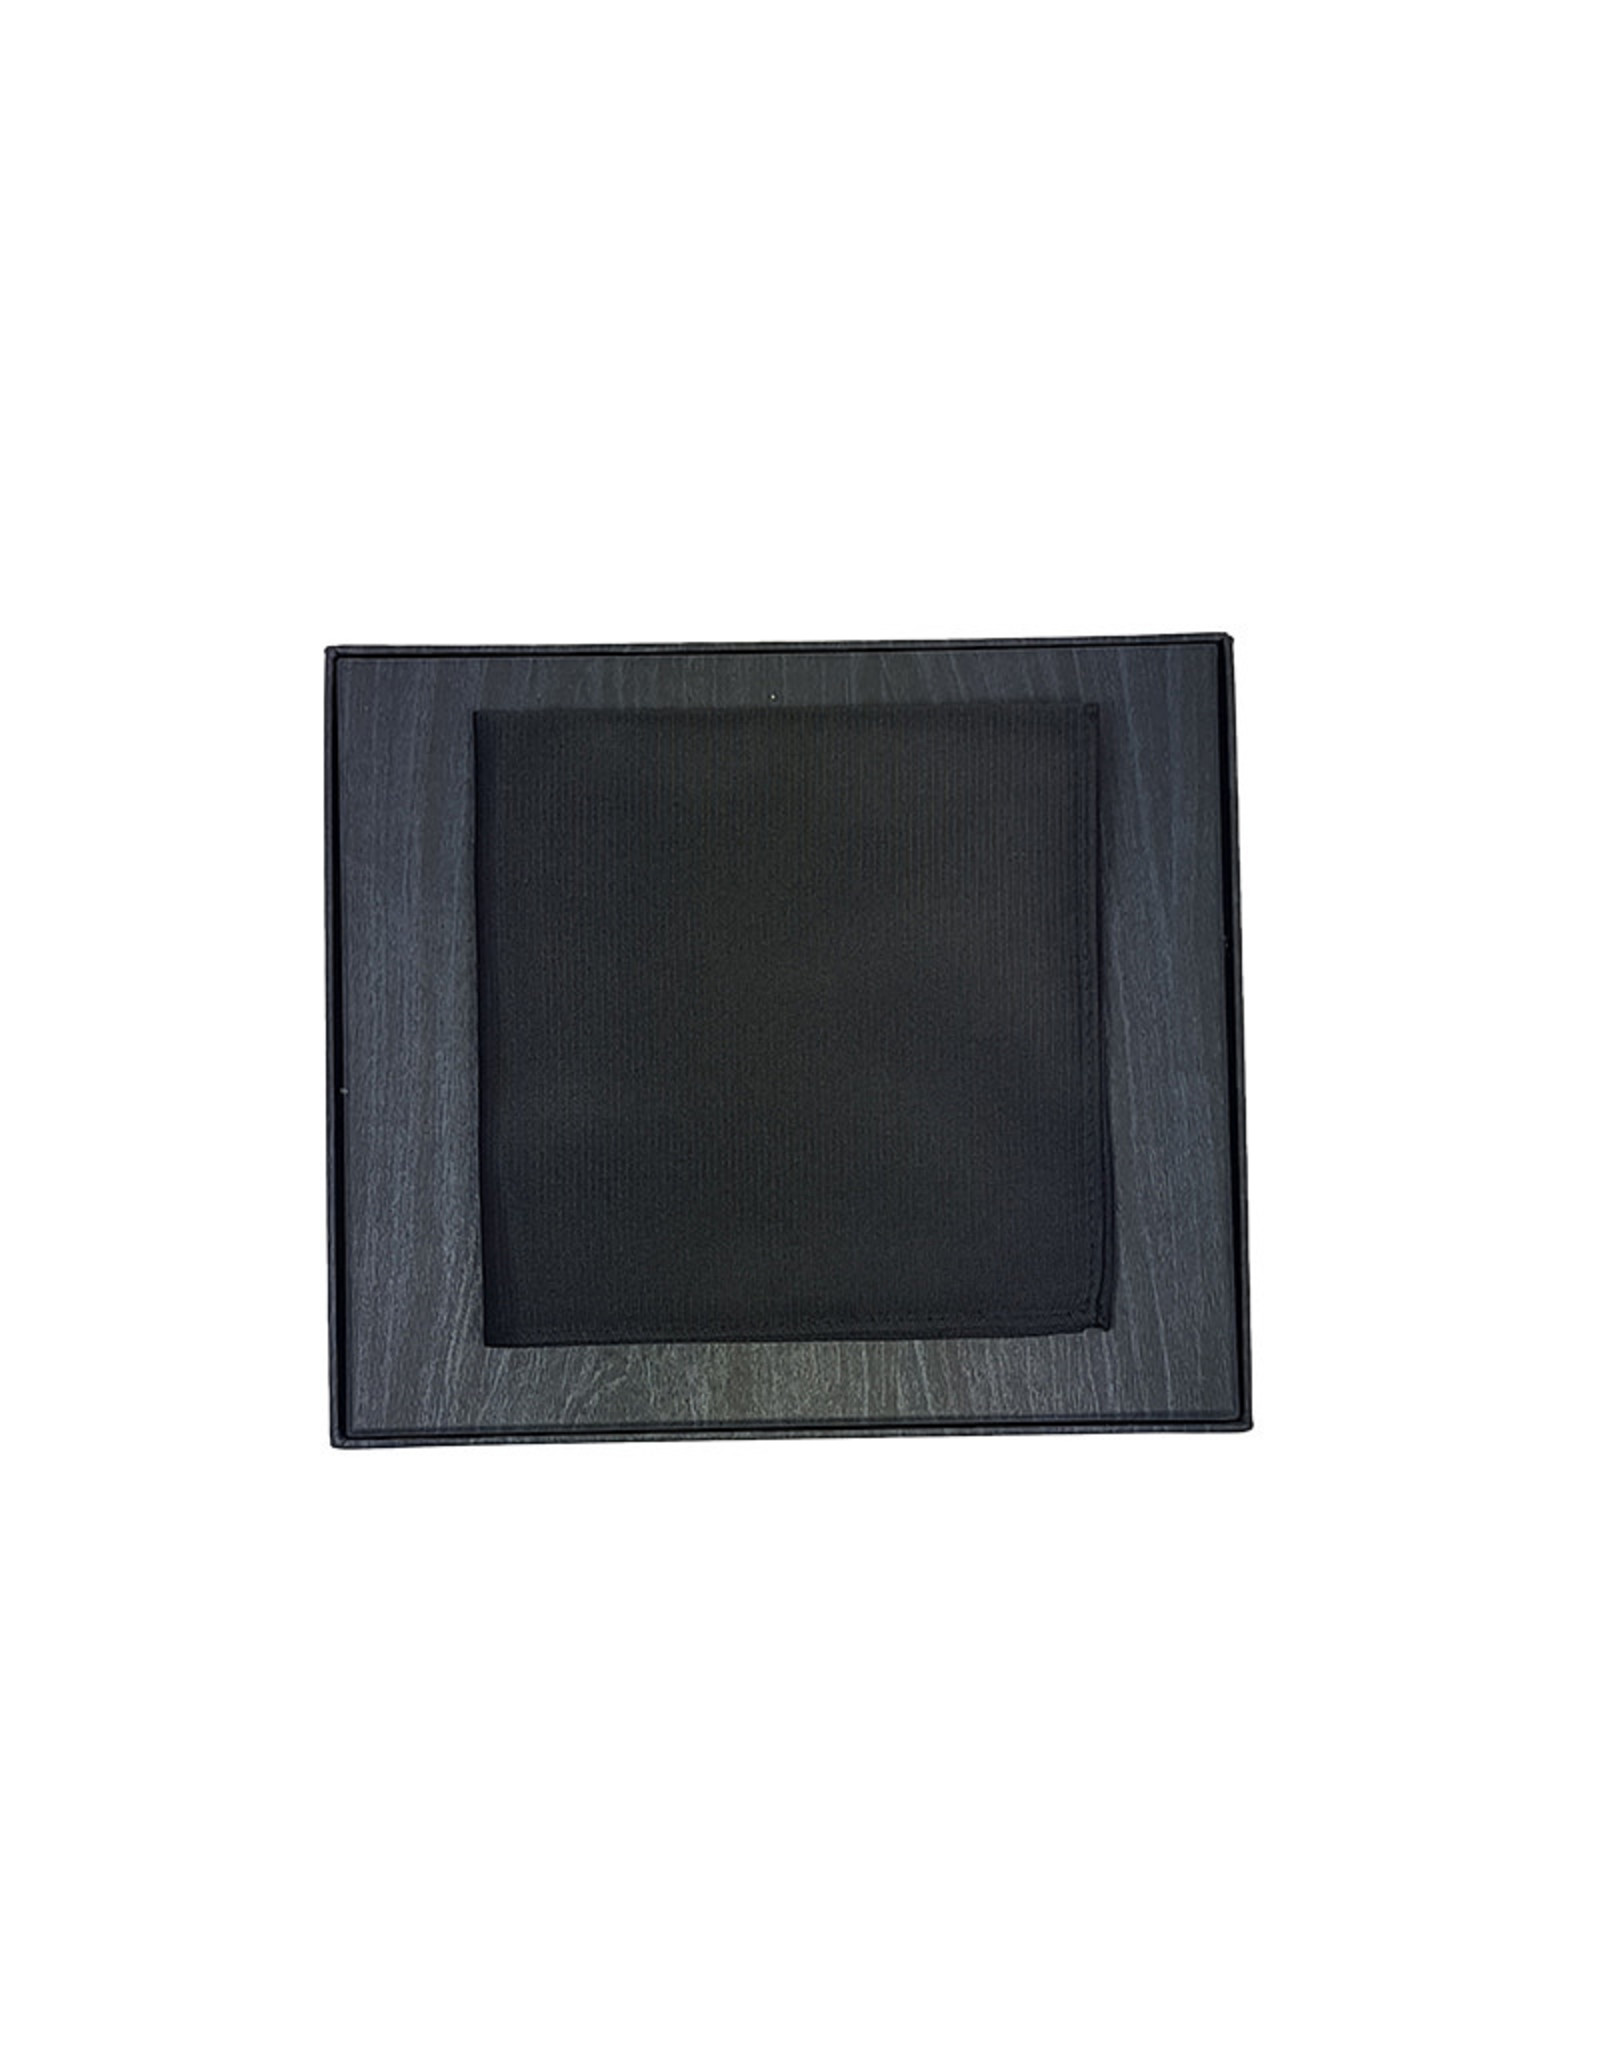 Ploenes Ploenes pochet zwart 14118/99